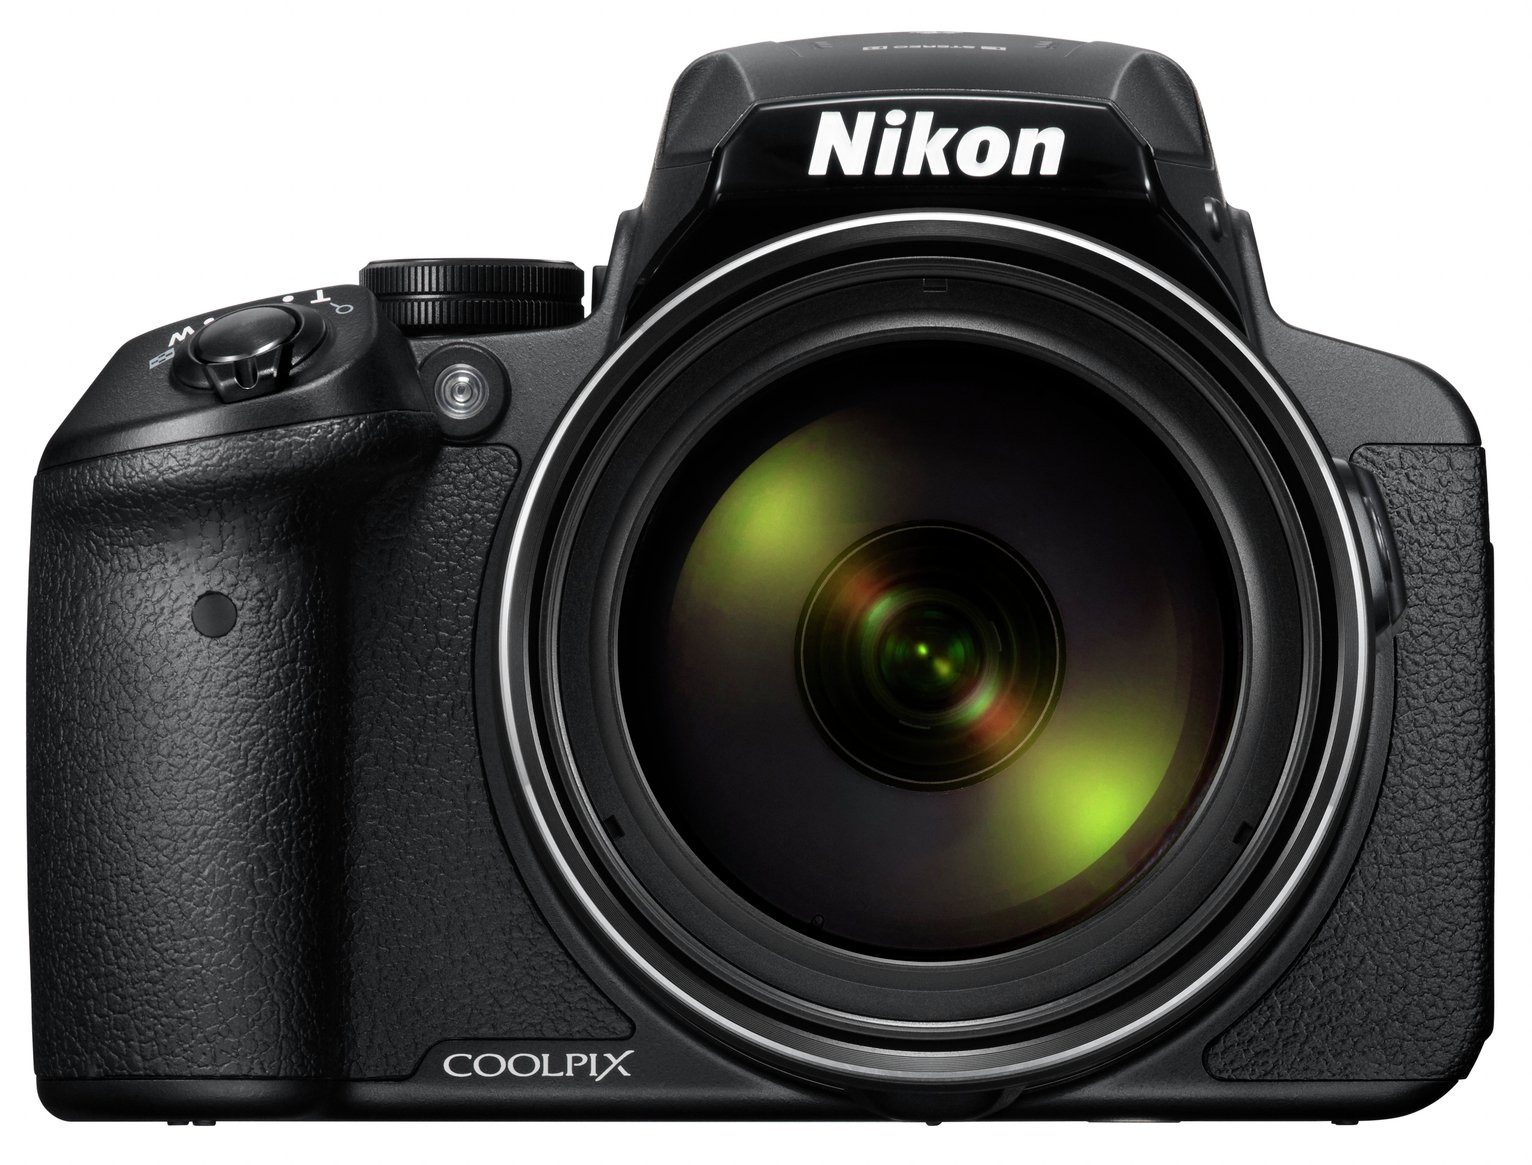 Nikon Coolpix P900 Bridge Camera - Black